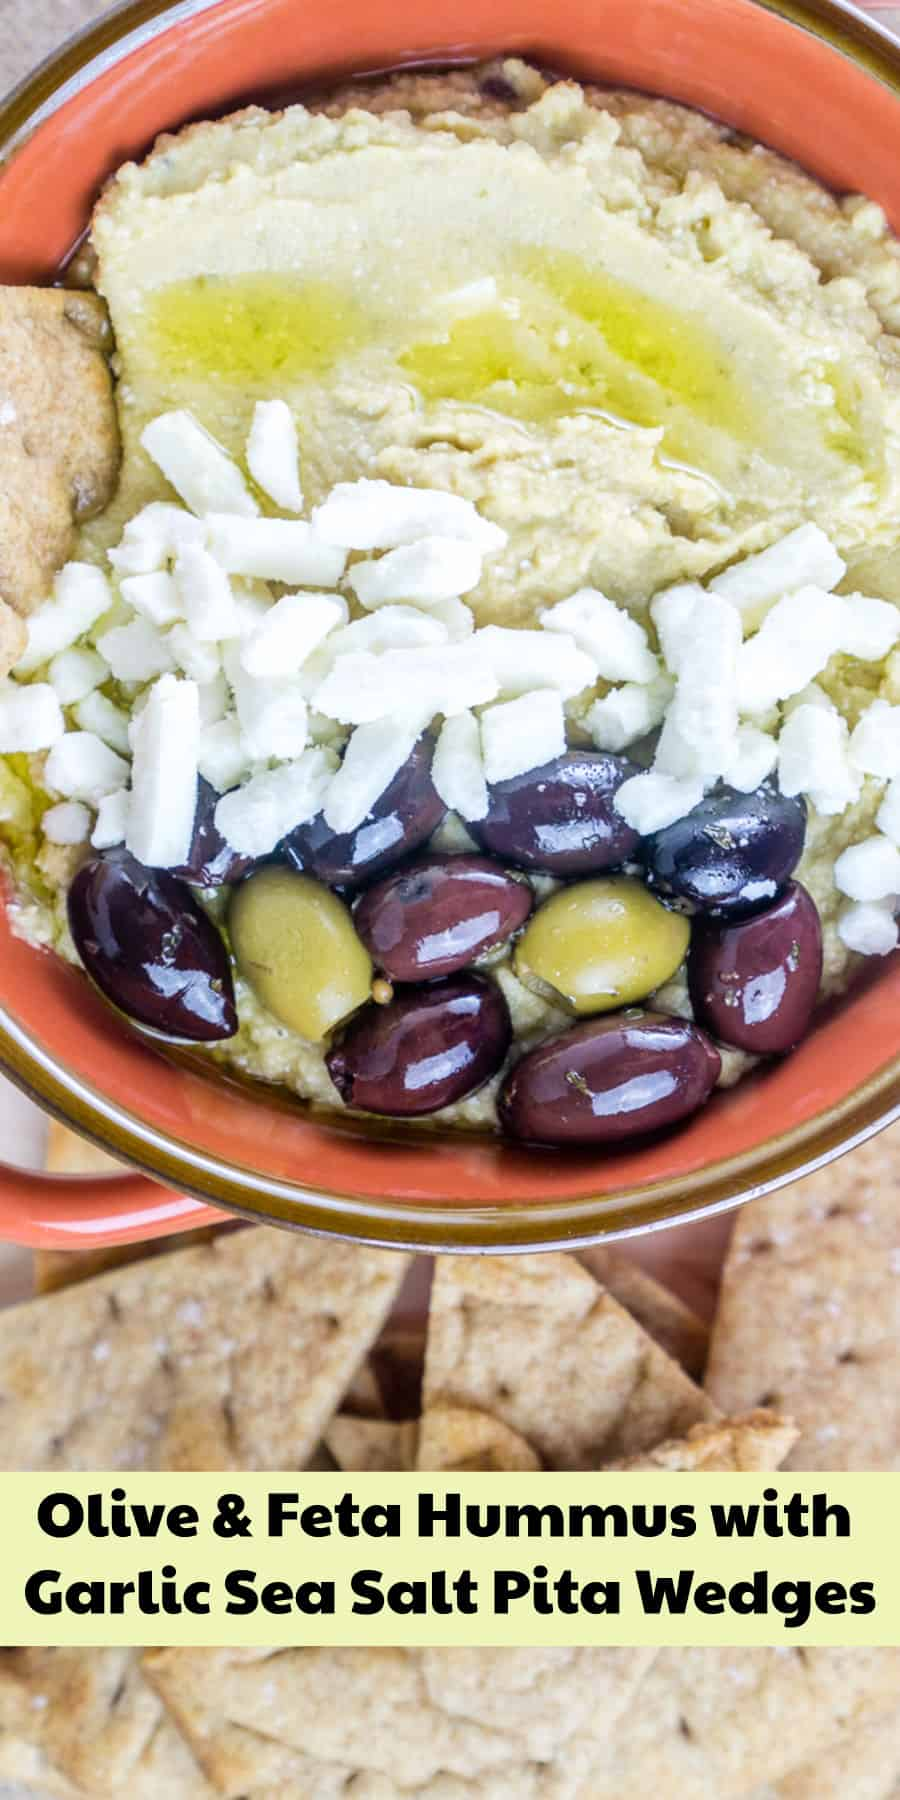 Olive & Feta Hummus with homemade Garlic Sea Salt Pita Chips - perfect for entertaining! #hummus #pita #chips #olives #fetacheese #feta #vegetarian #pitachips #snacking #entertaining #superbowlrecipes #hummusrecipes